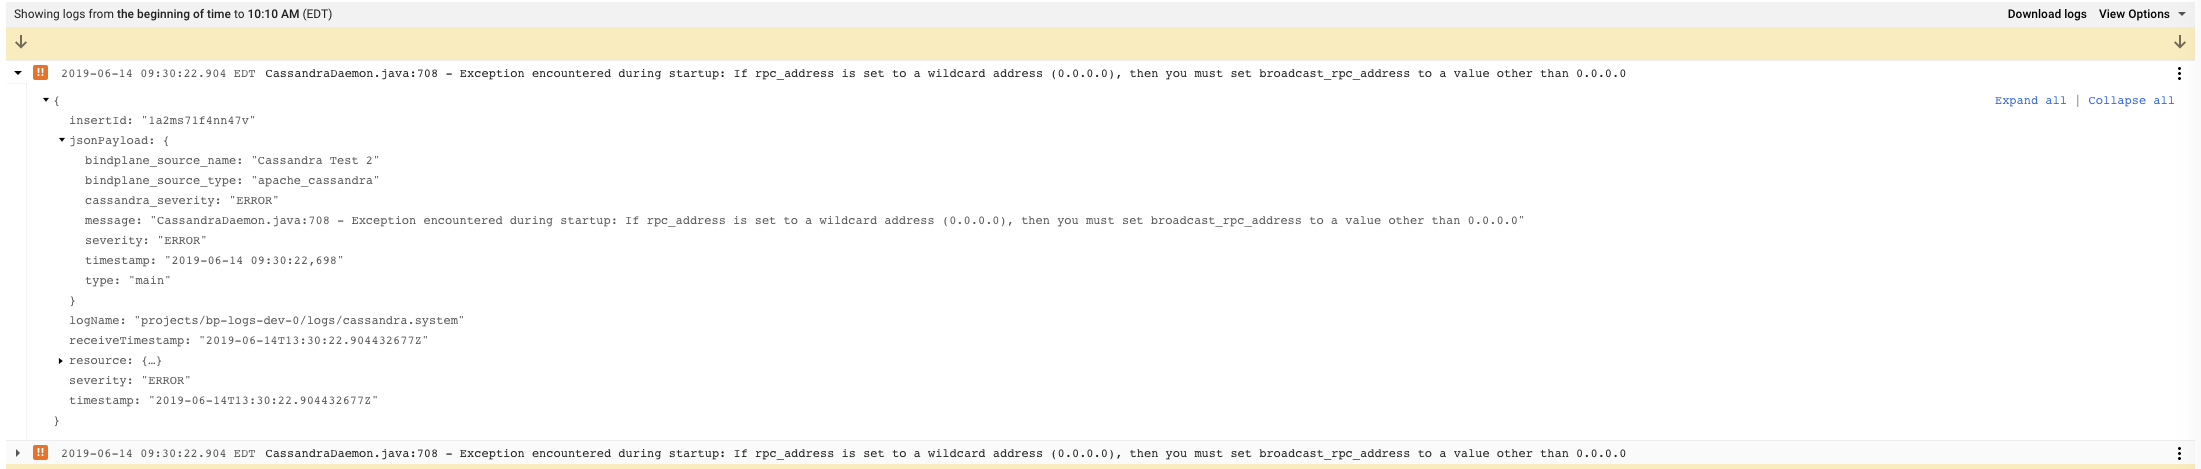 Apache Cassandra System Logs Example